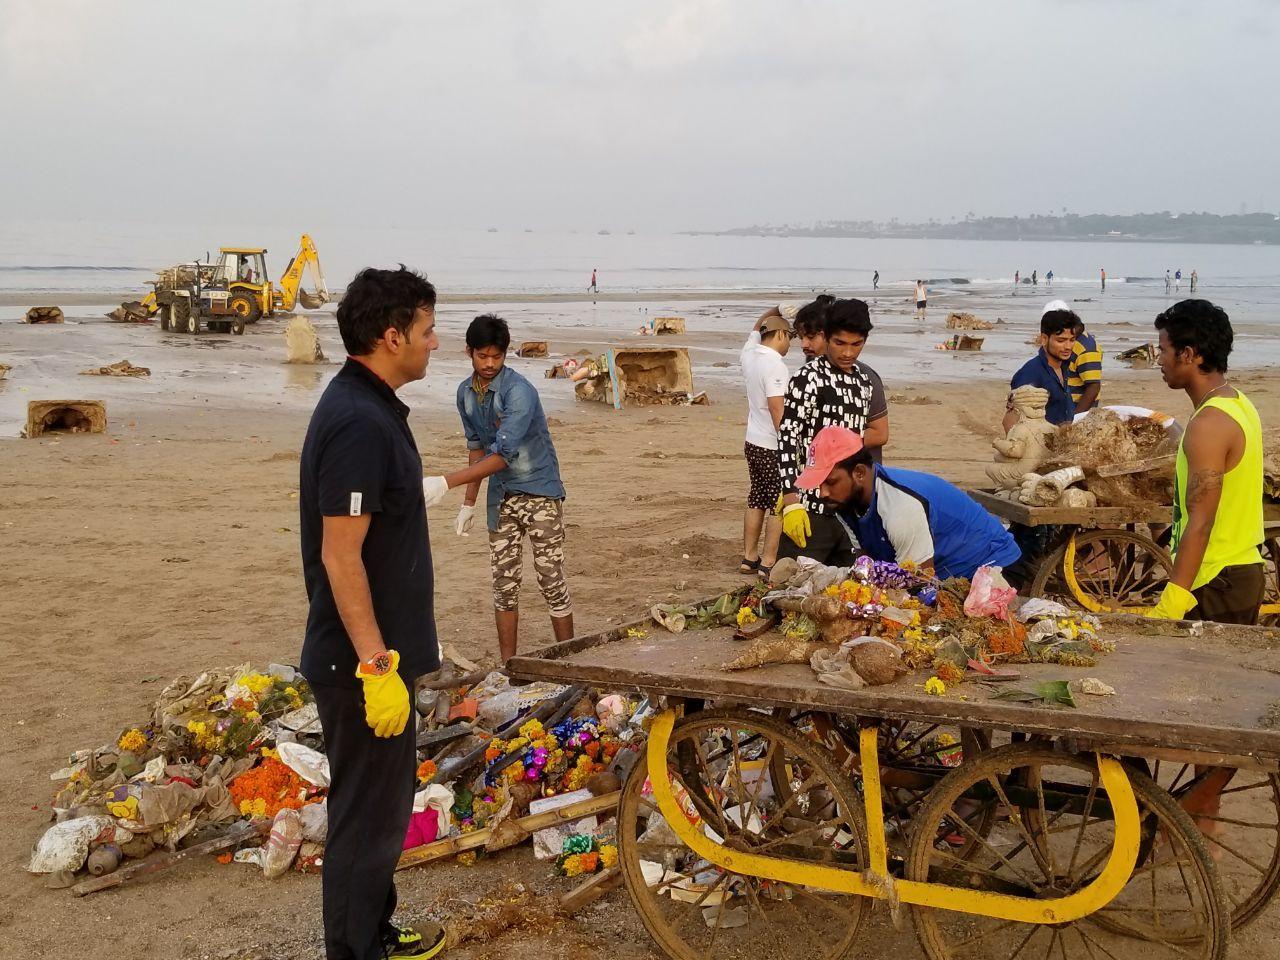 Afroz Shah Along With 900 People Removed 80,000 Kilos Of Waste And 7400 Ganesh Idols Post Ganpati Visarjan From Versova, Randeep Hooda Joins In